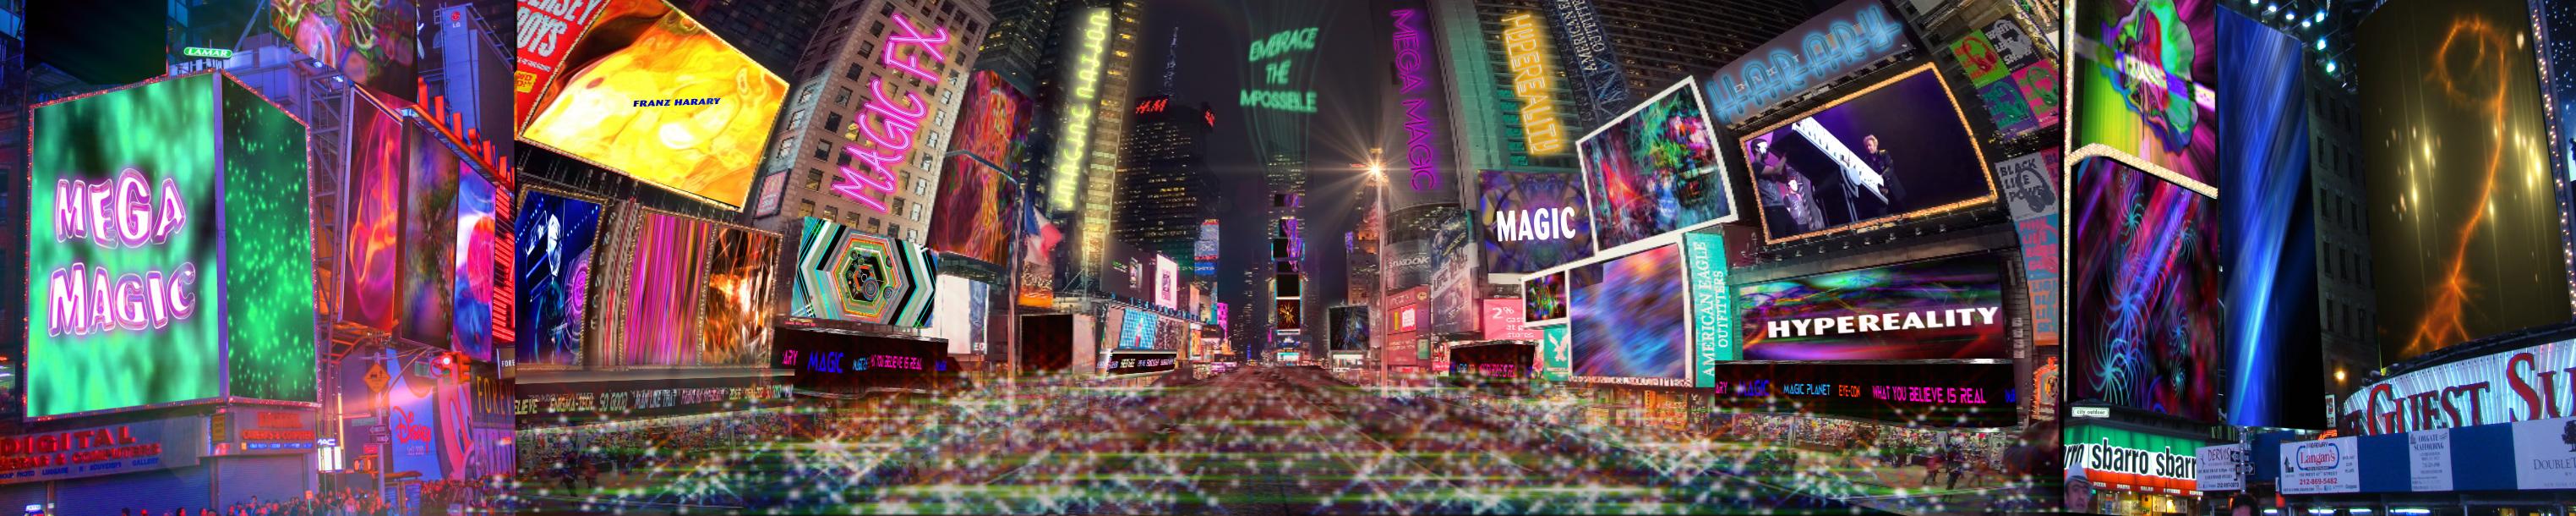 Time Square_01687.jpg